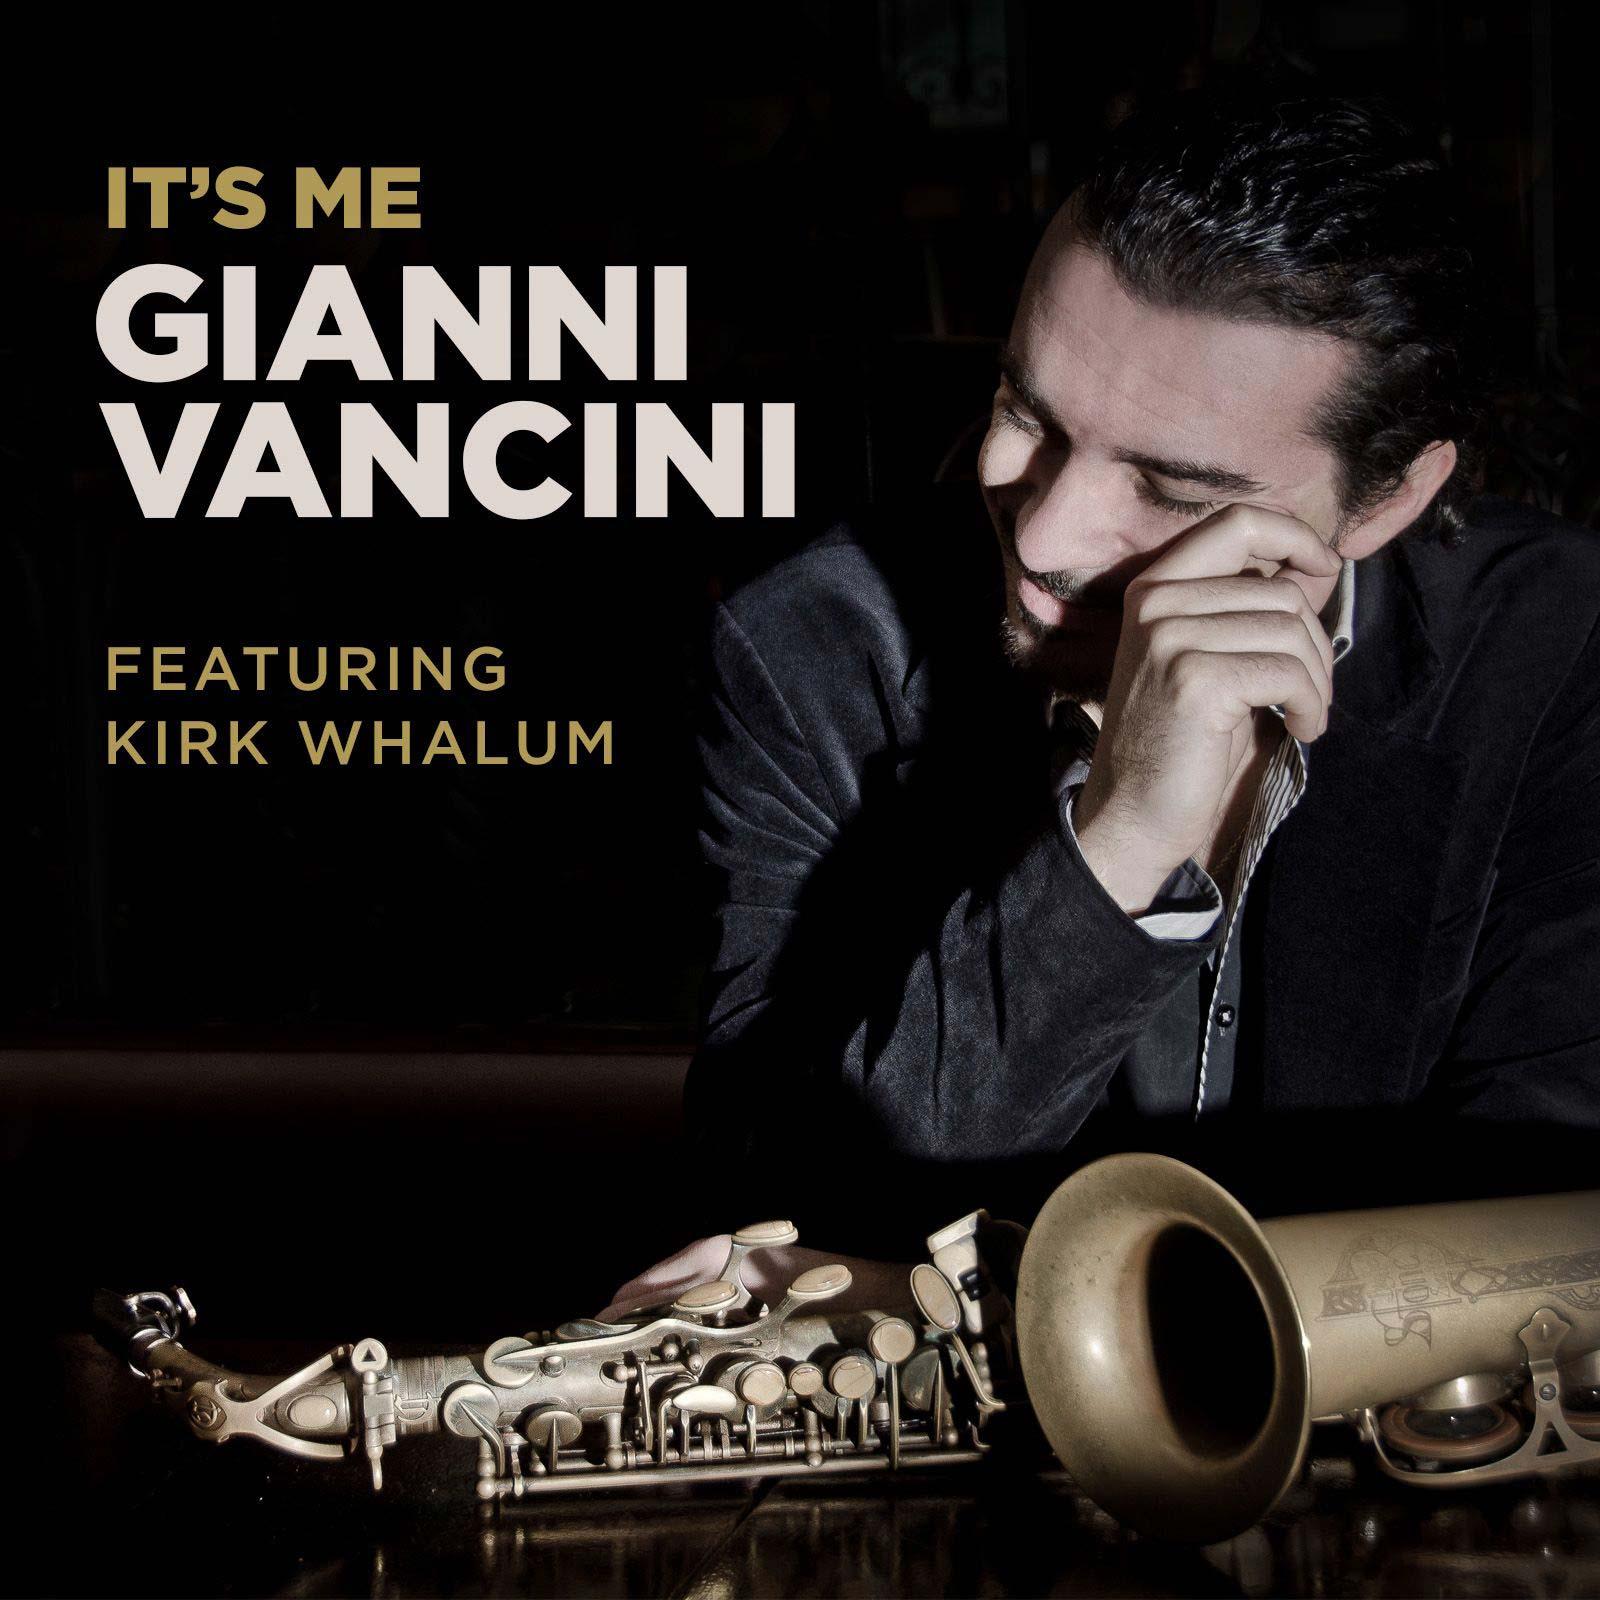 Gianni_Vancini_Its_Me_3_250_k